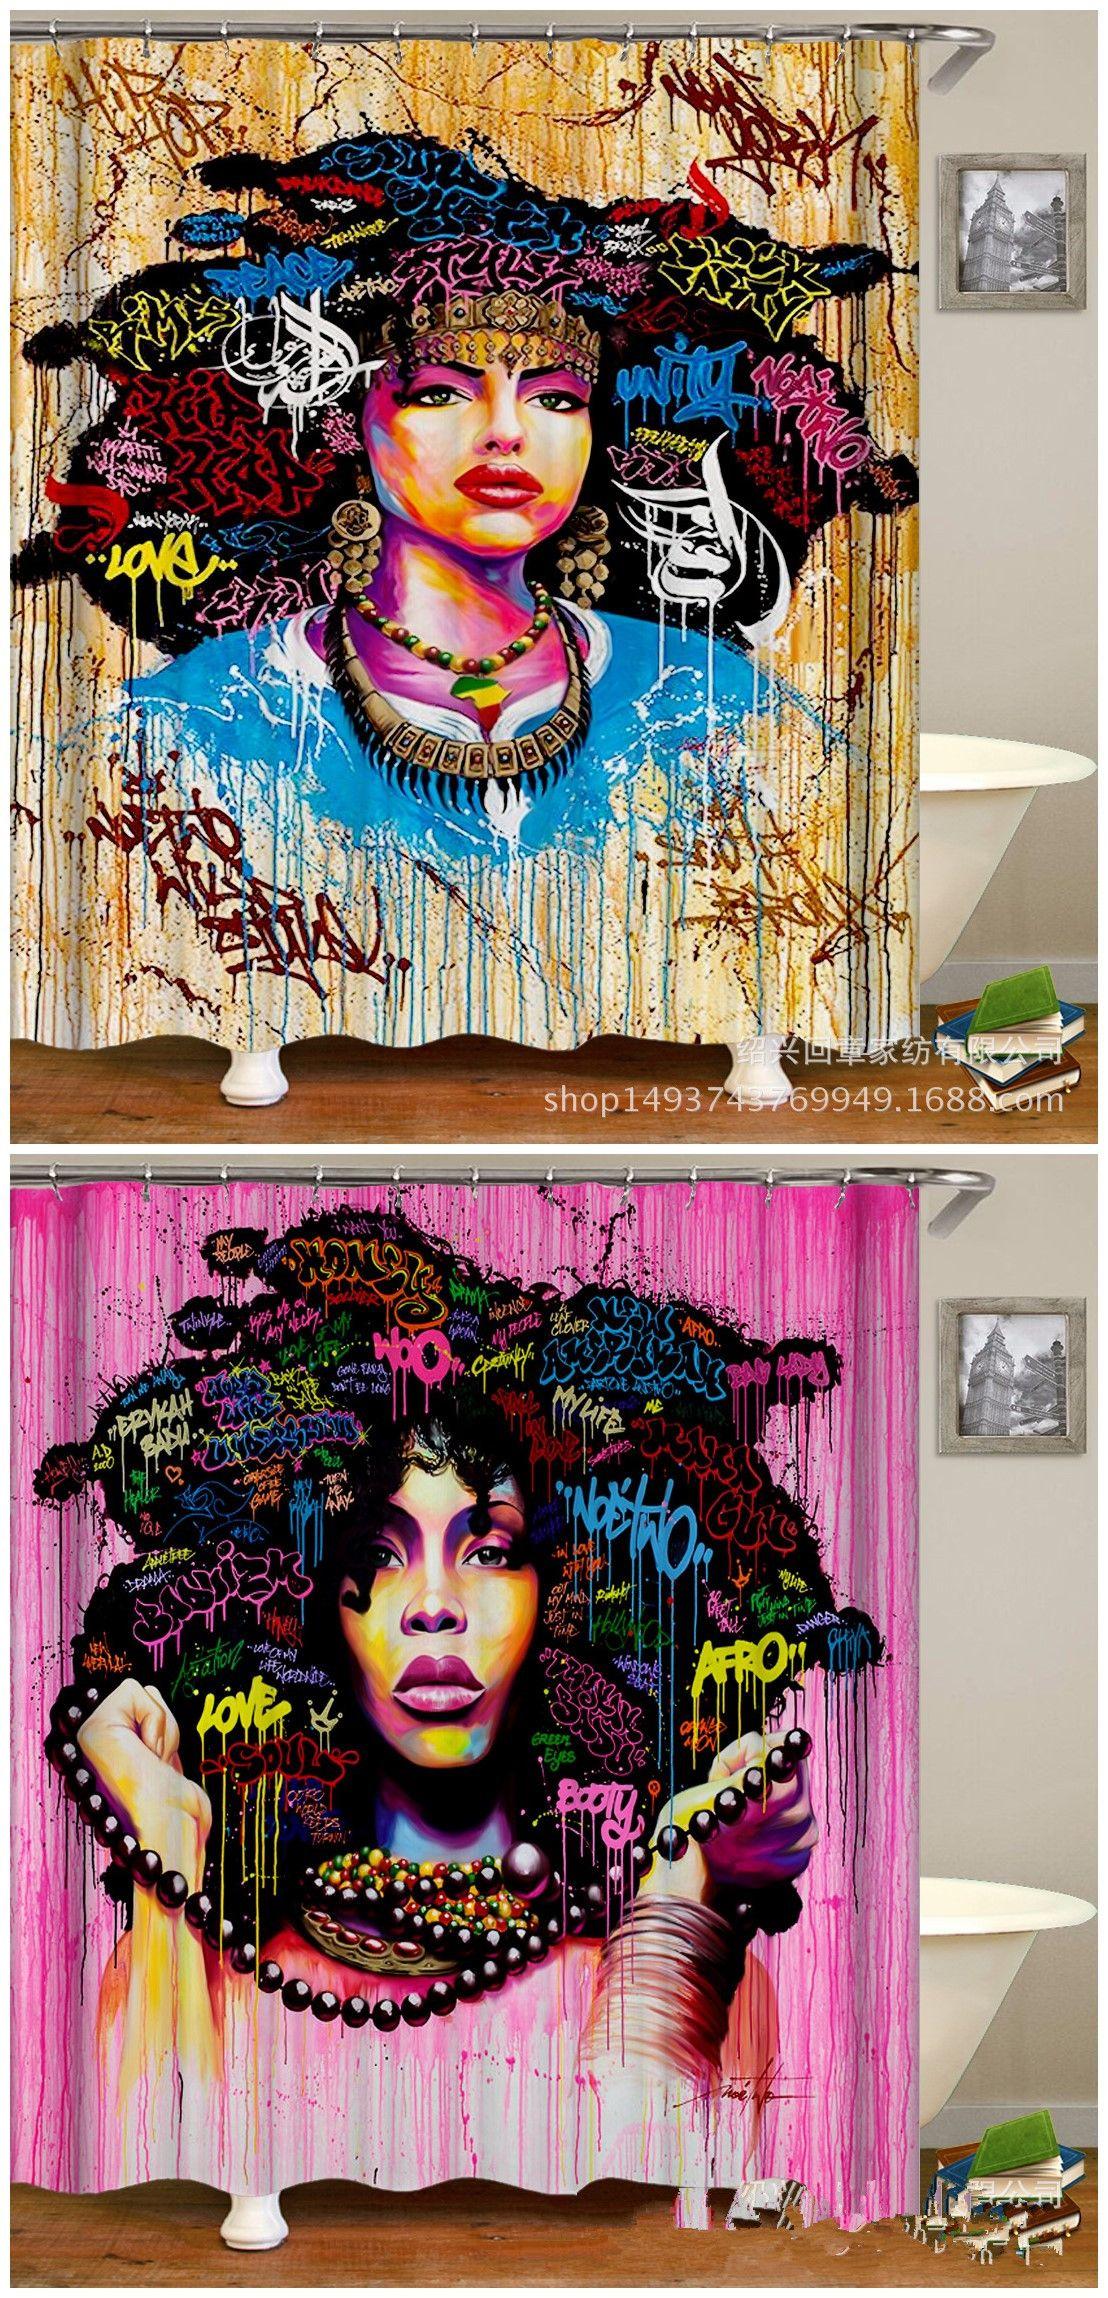 Chengsan Afro Hair Hippie Woman Pop Art Pattern Shower Curtain Polyester Fabric Bathroom Curtain Waterproof Mildew Resistant Fabric Bathroom Decor with Hooks